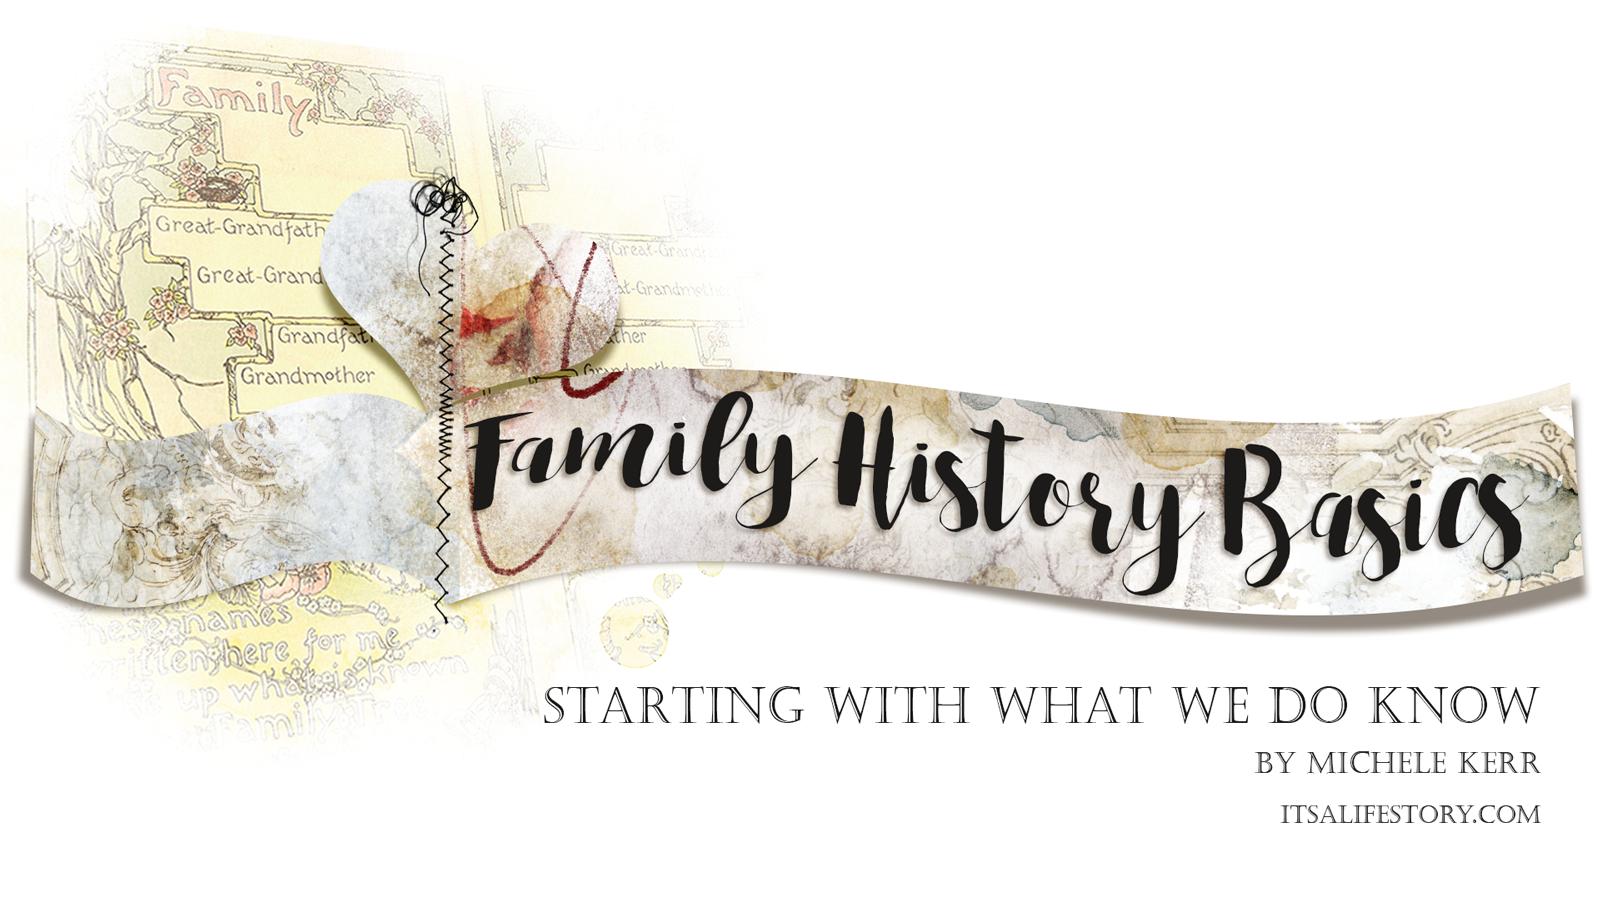 ItsALifeStory.com _ FAMILY HISTORY BASICS - Starting With What We DO Know